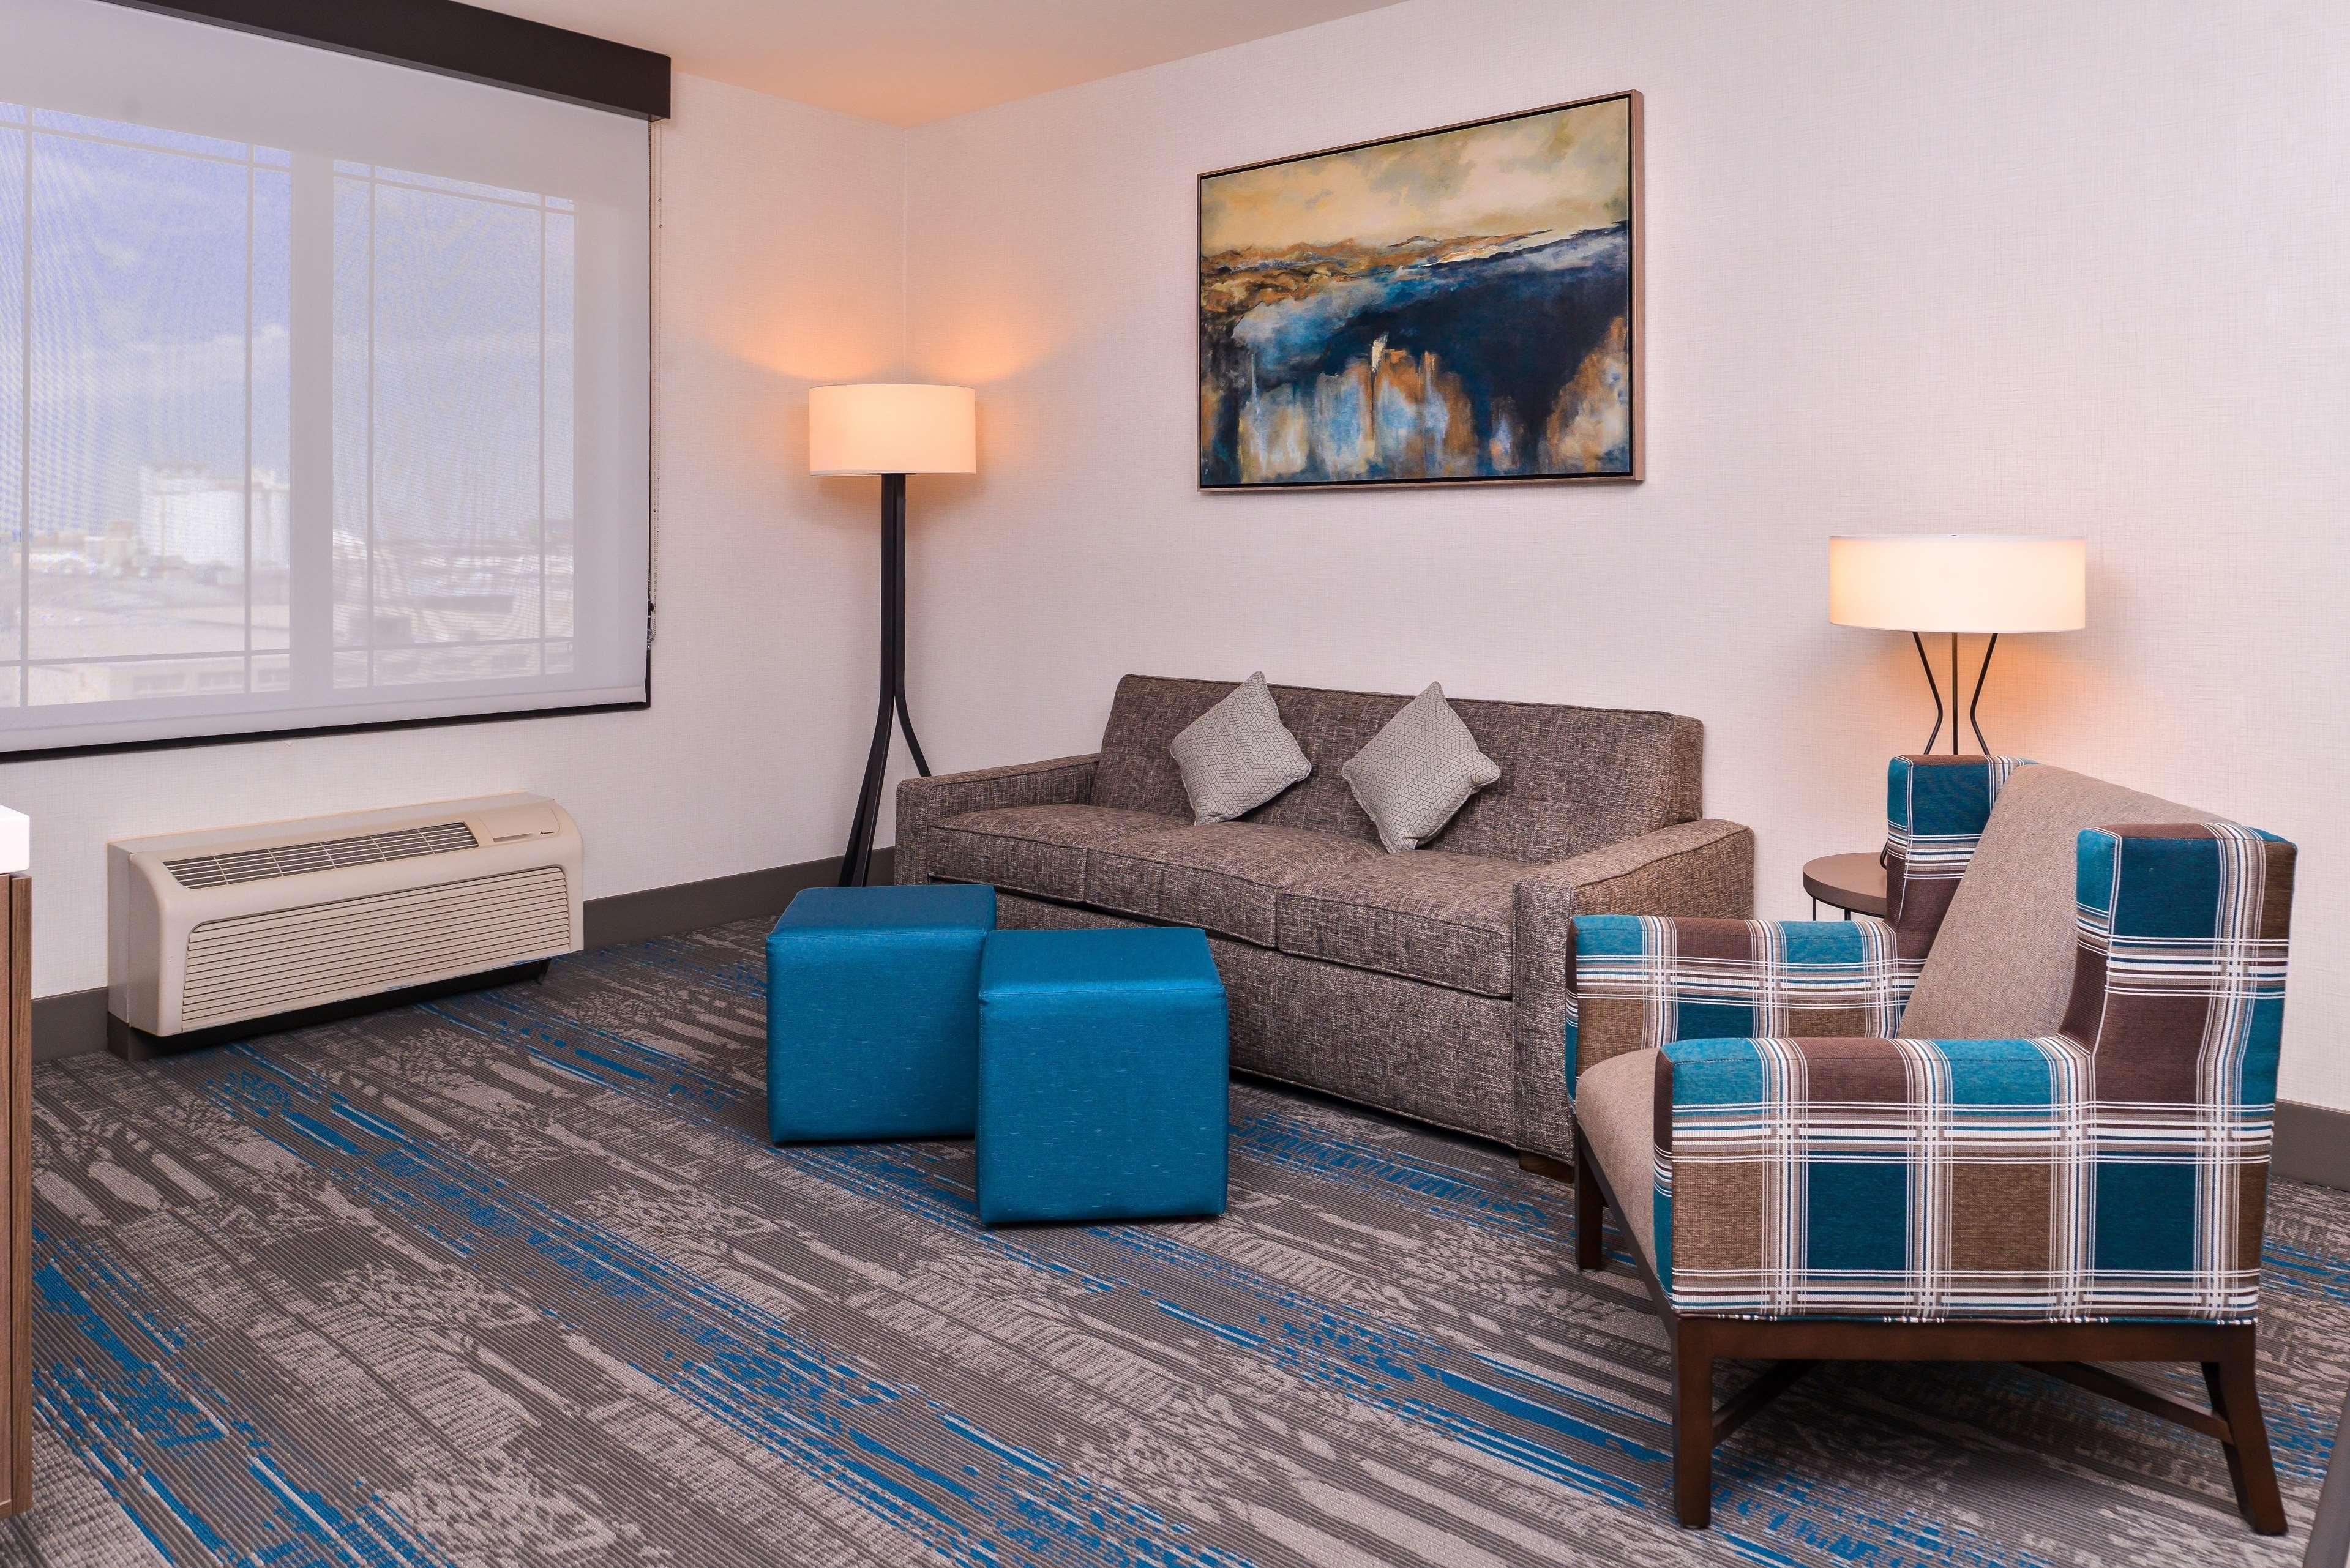 Hilton Garden Inn Salt Lake City Downtown image 44